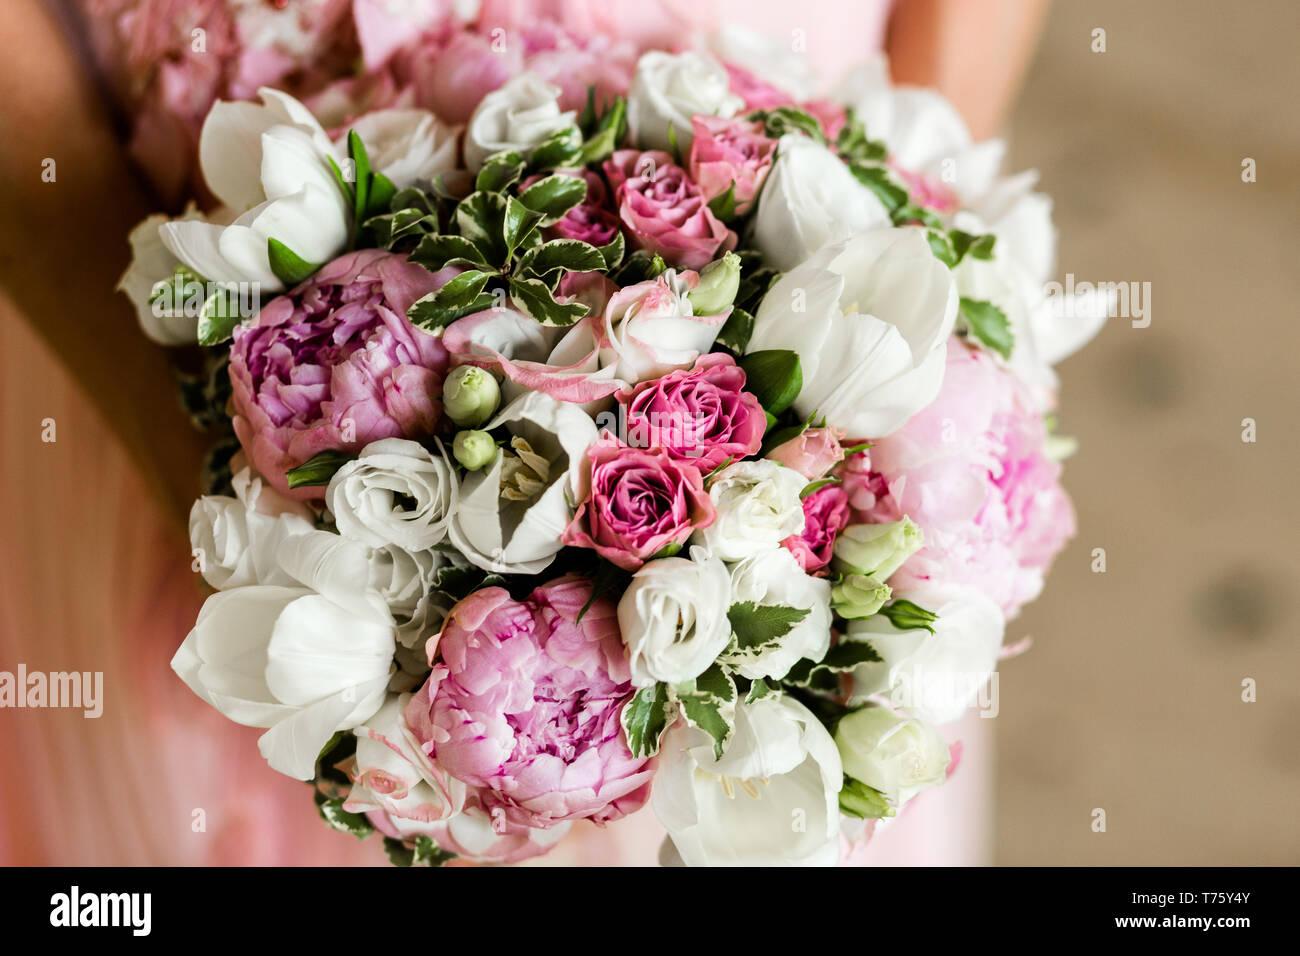 Bouquet Peonie Sposa.Unrecognizable Bride Holding A Refined Wedding Bouquet Of Pink